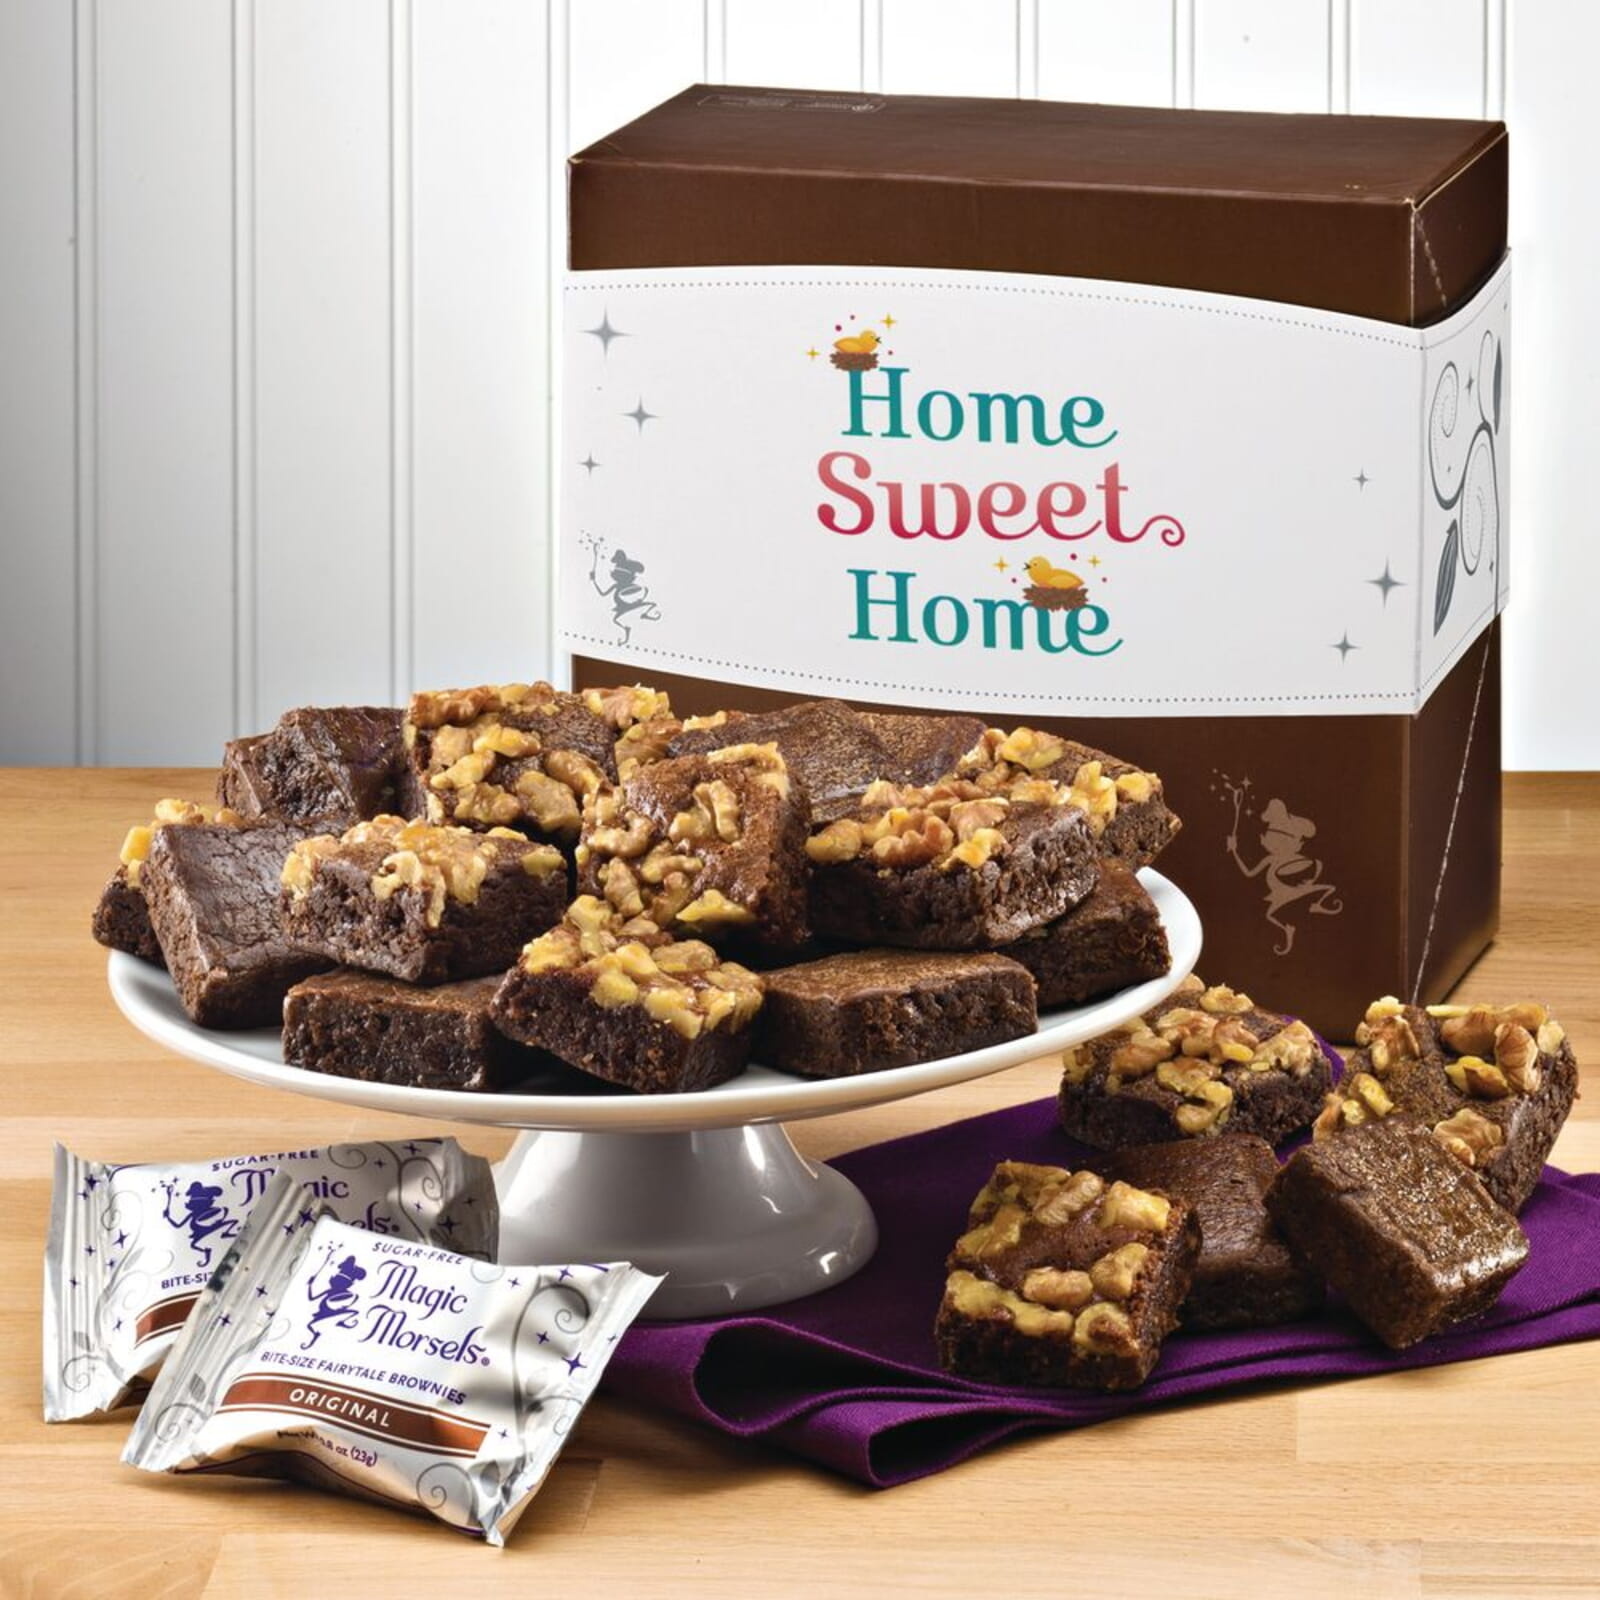 Home Sweet Home Sugar-Free Morsel 24